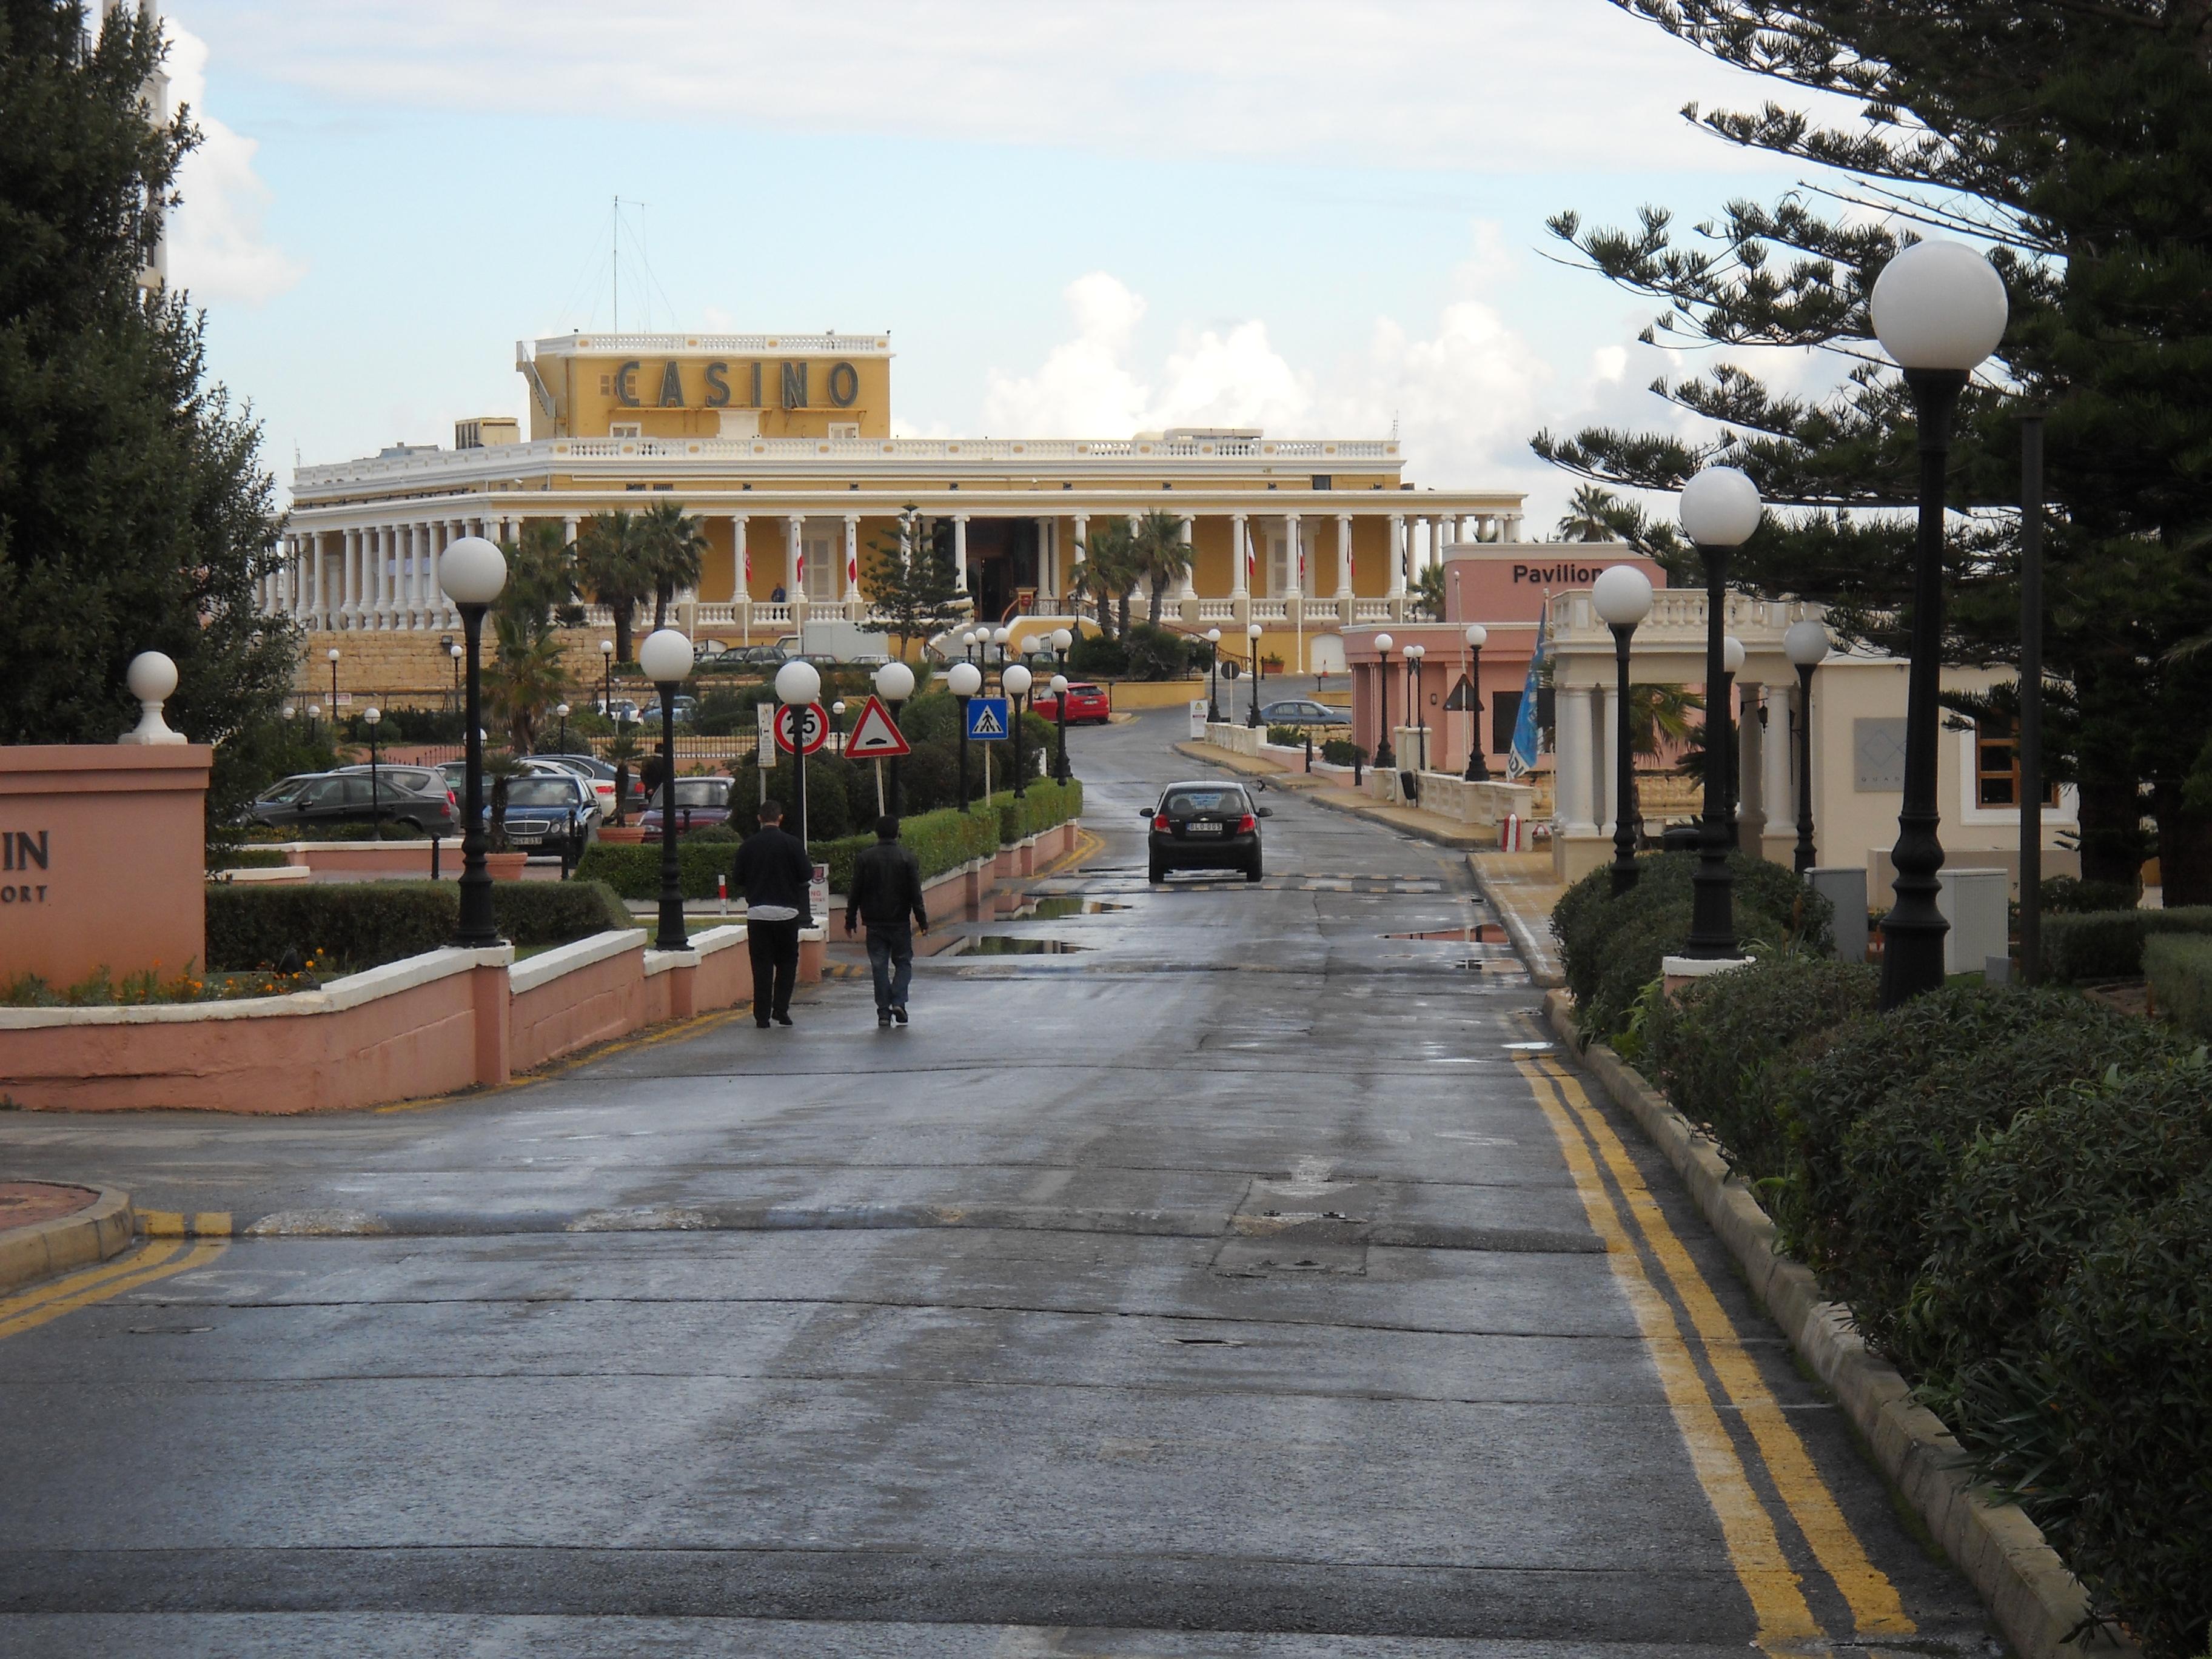 File:Casino in Malta.jpg - Wikimedia Commons